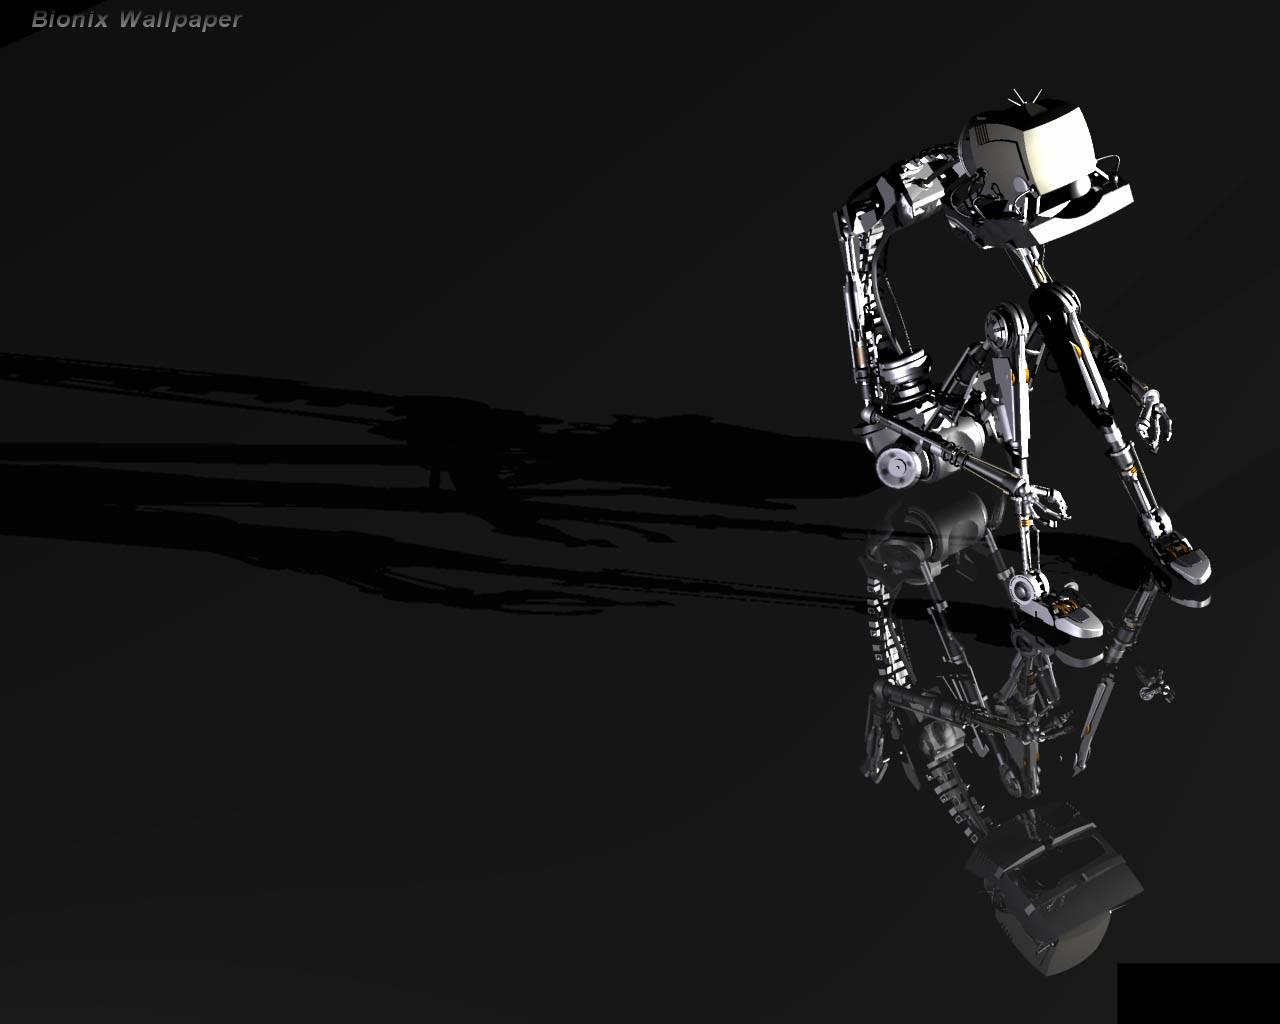 robot wallpaper robot wallpaper robot wallpaper wallpaper desktop 1280x1024